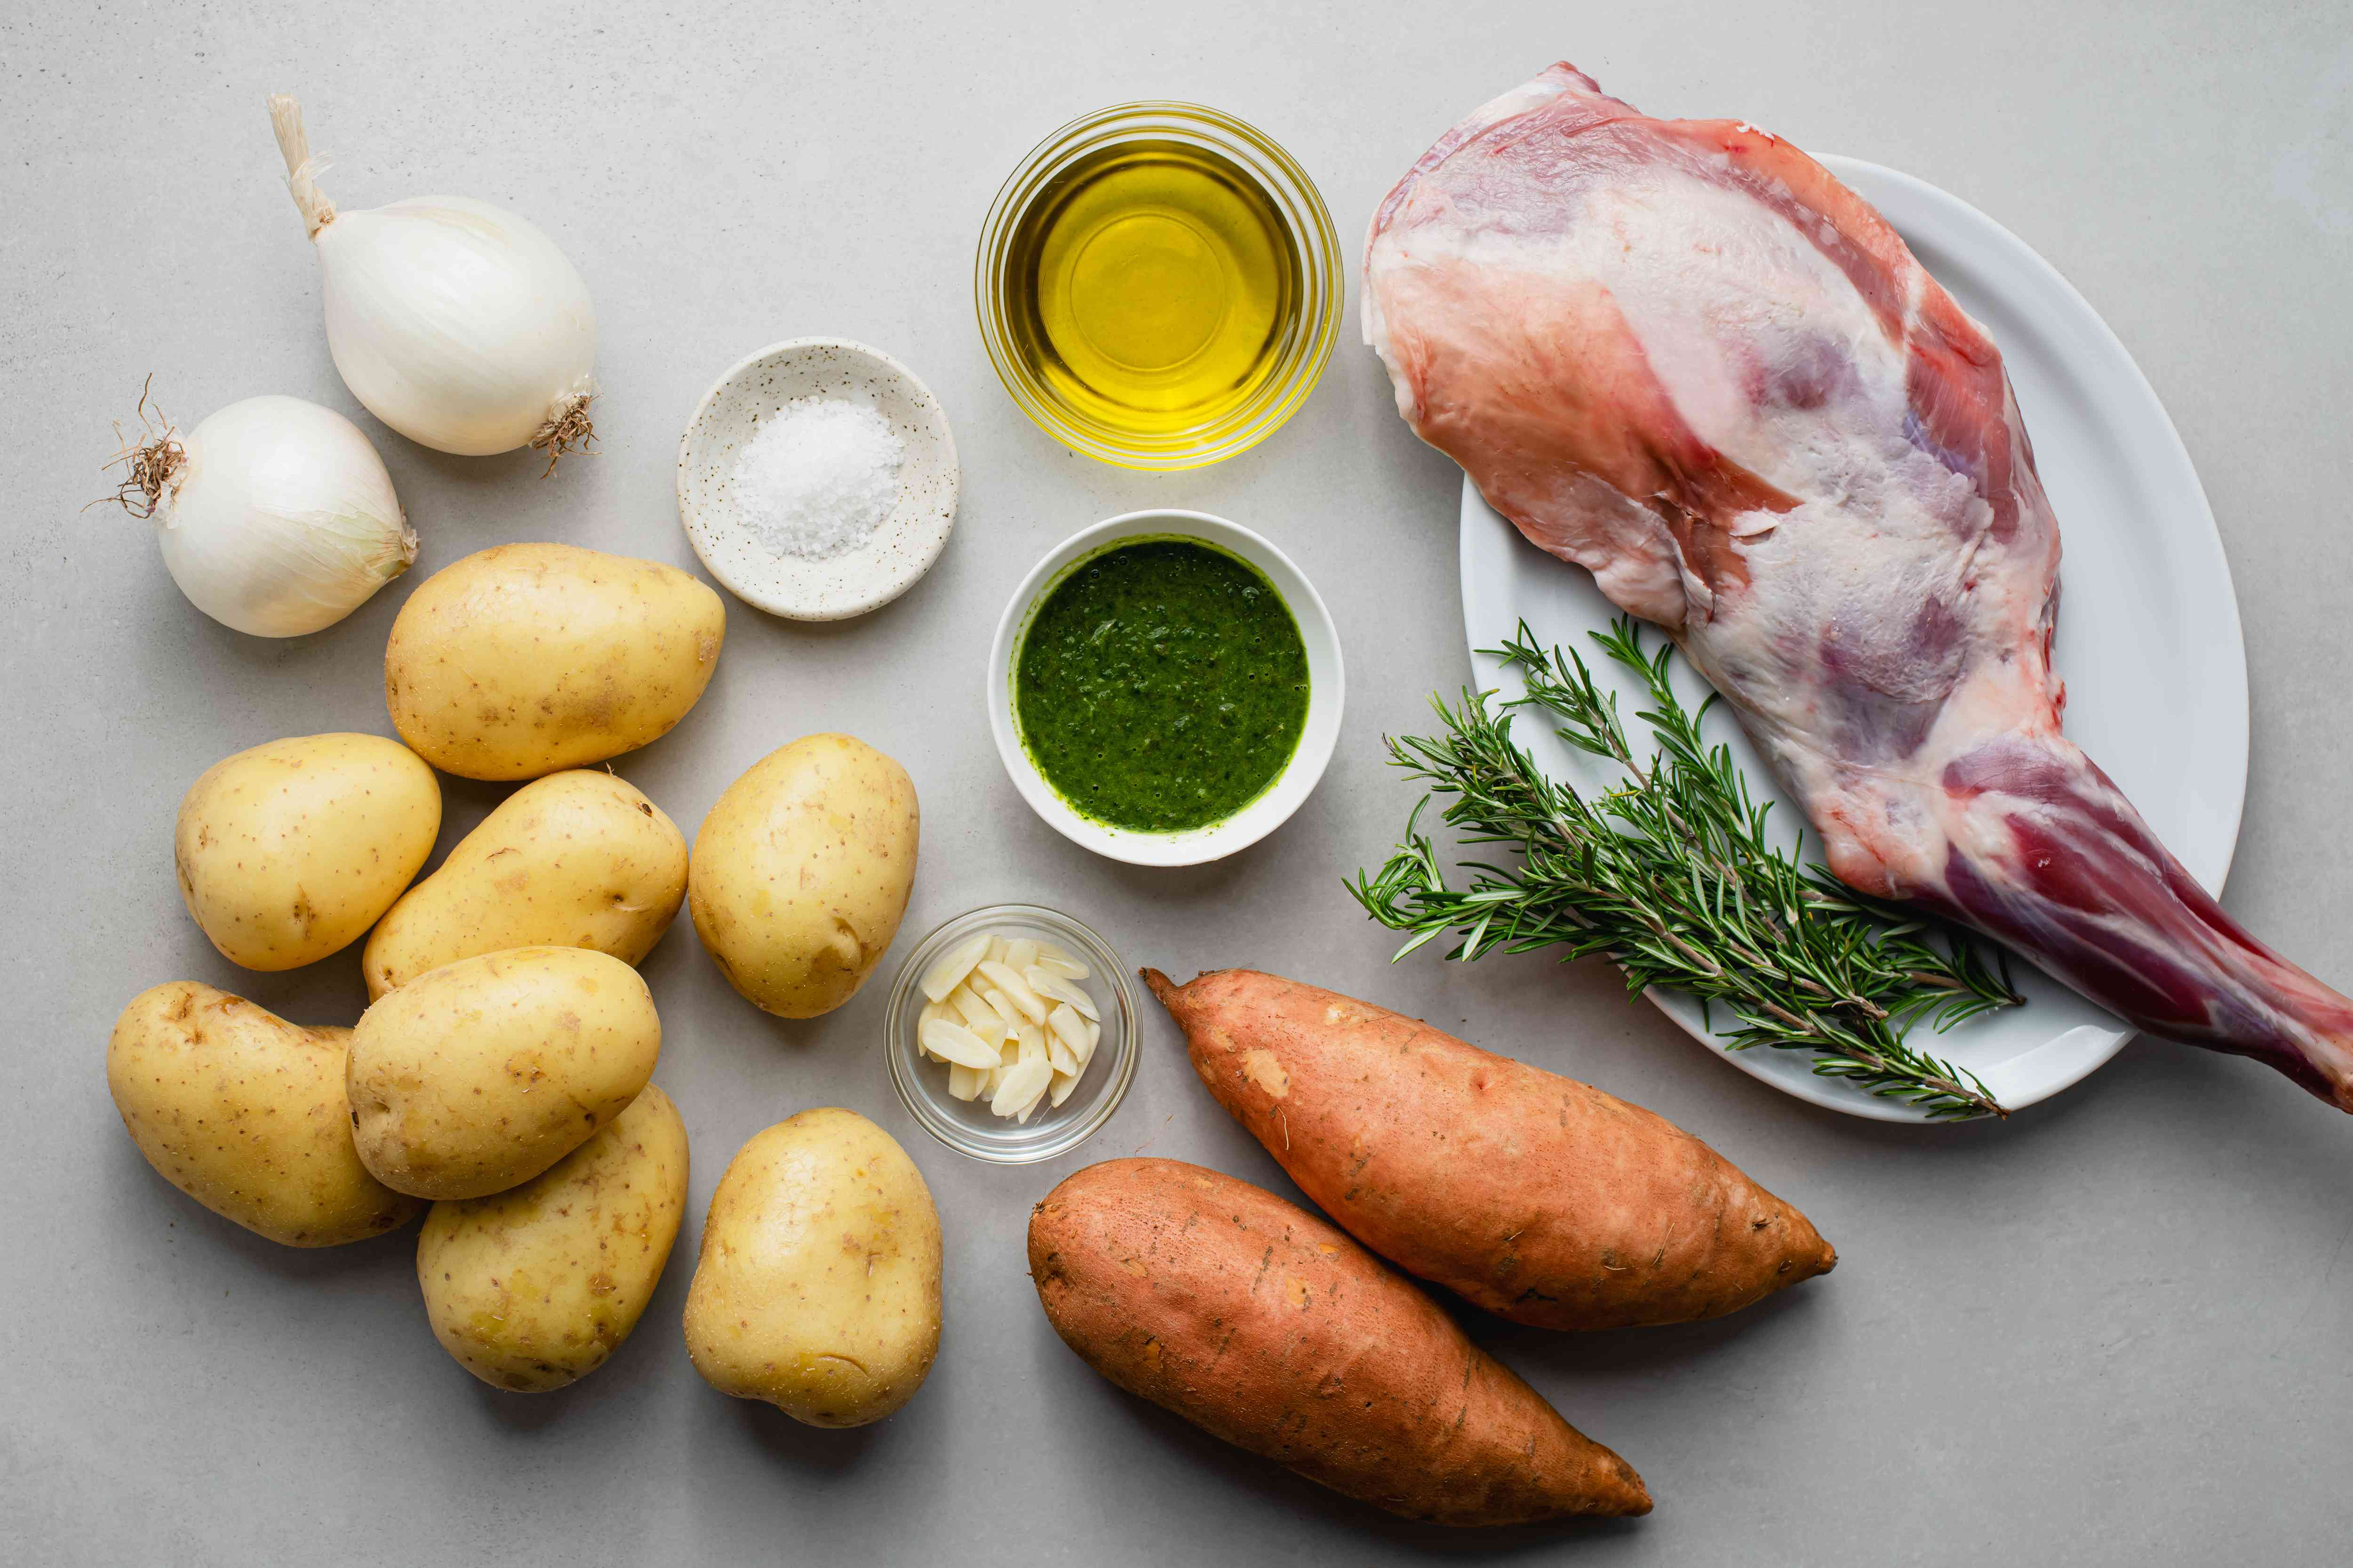 Traditional Lamb Shoulder Roast ingredients